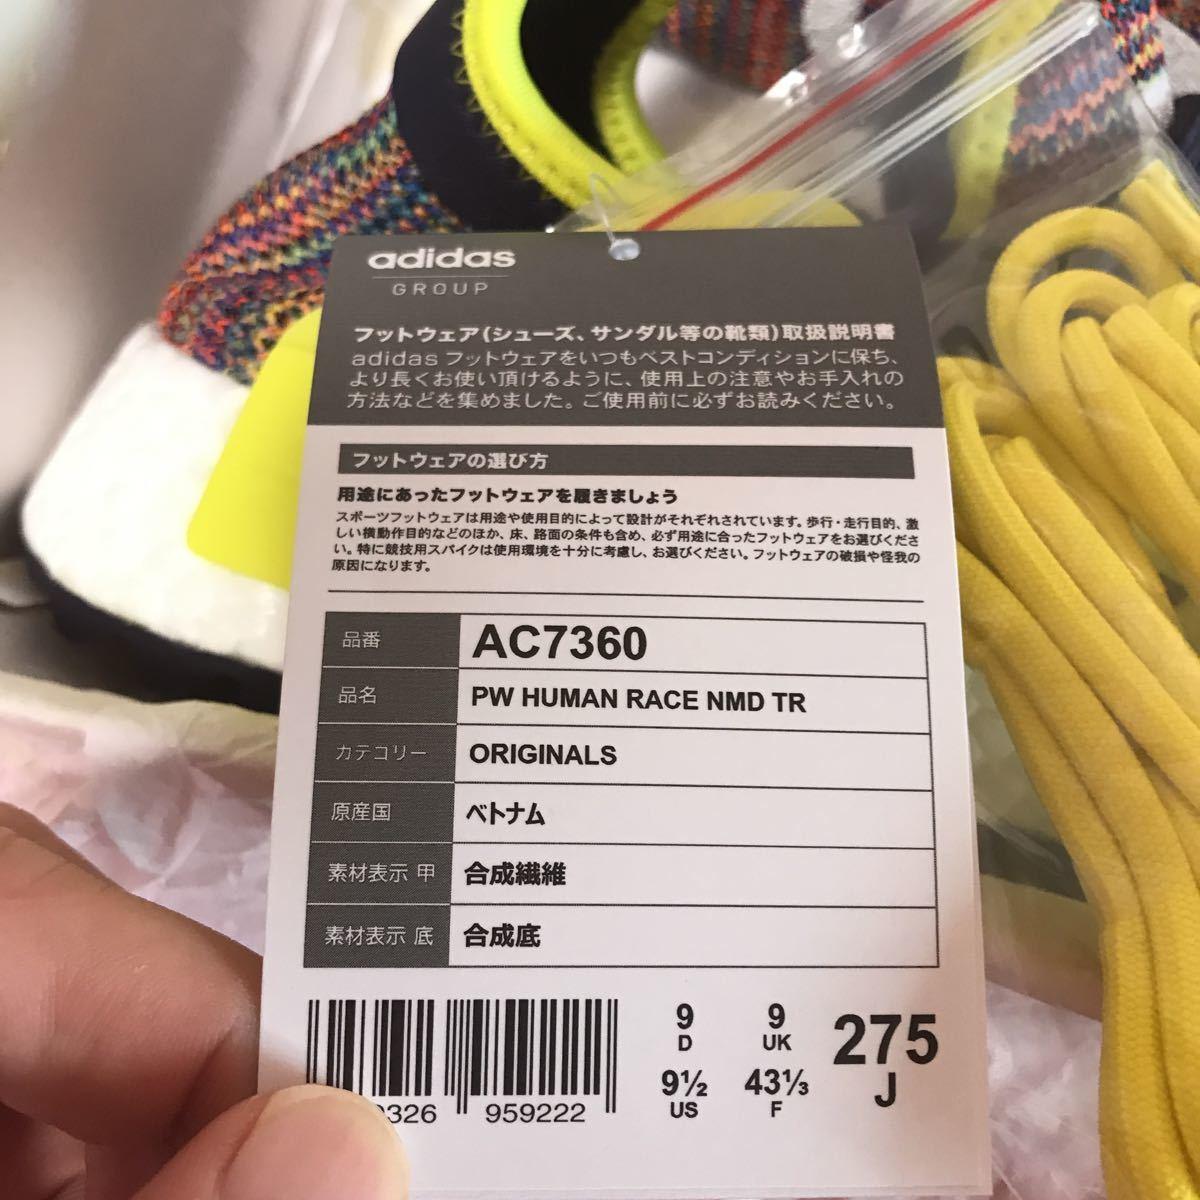 27.5cm 国内正規品 Adidas Originals Pharrell Williams PW Human Race NMD TR US9.5 AC7360_画像3